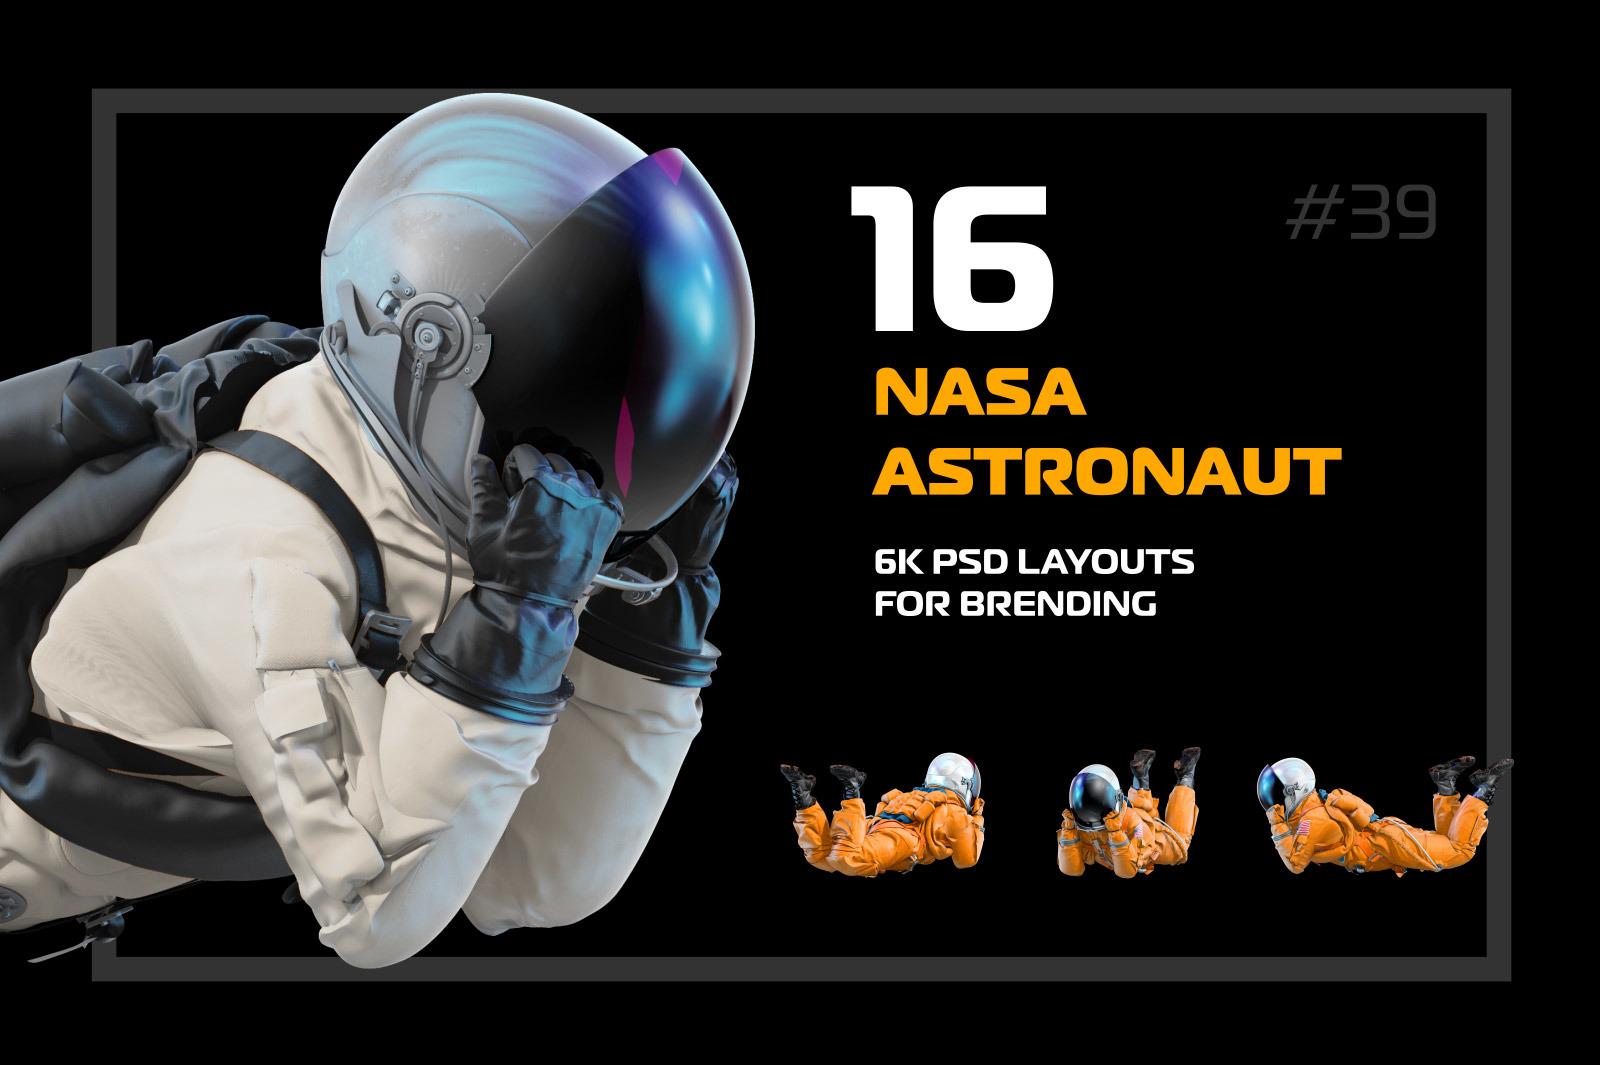 PSD Mockup 3D model NASA Astronaut #39